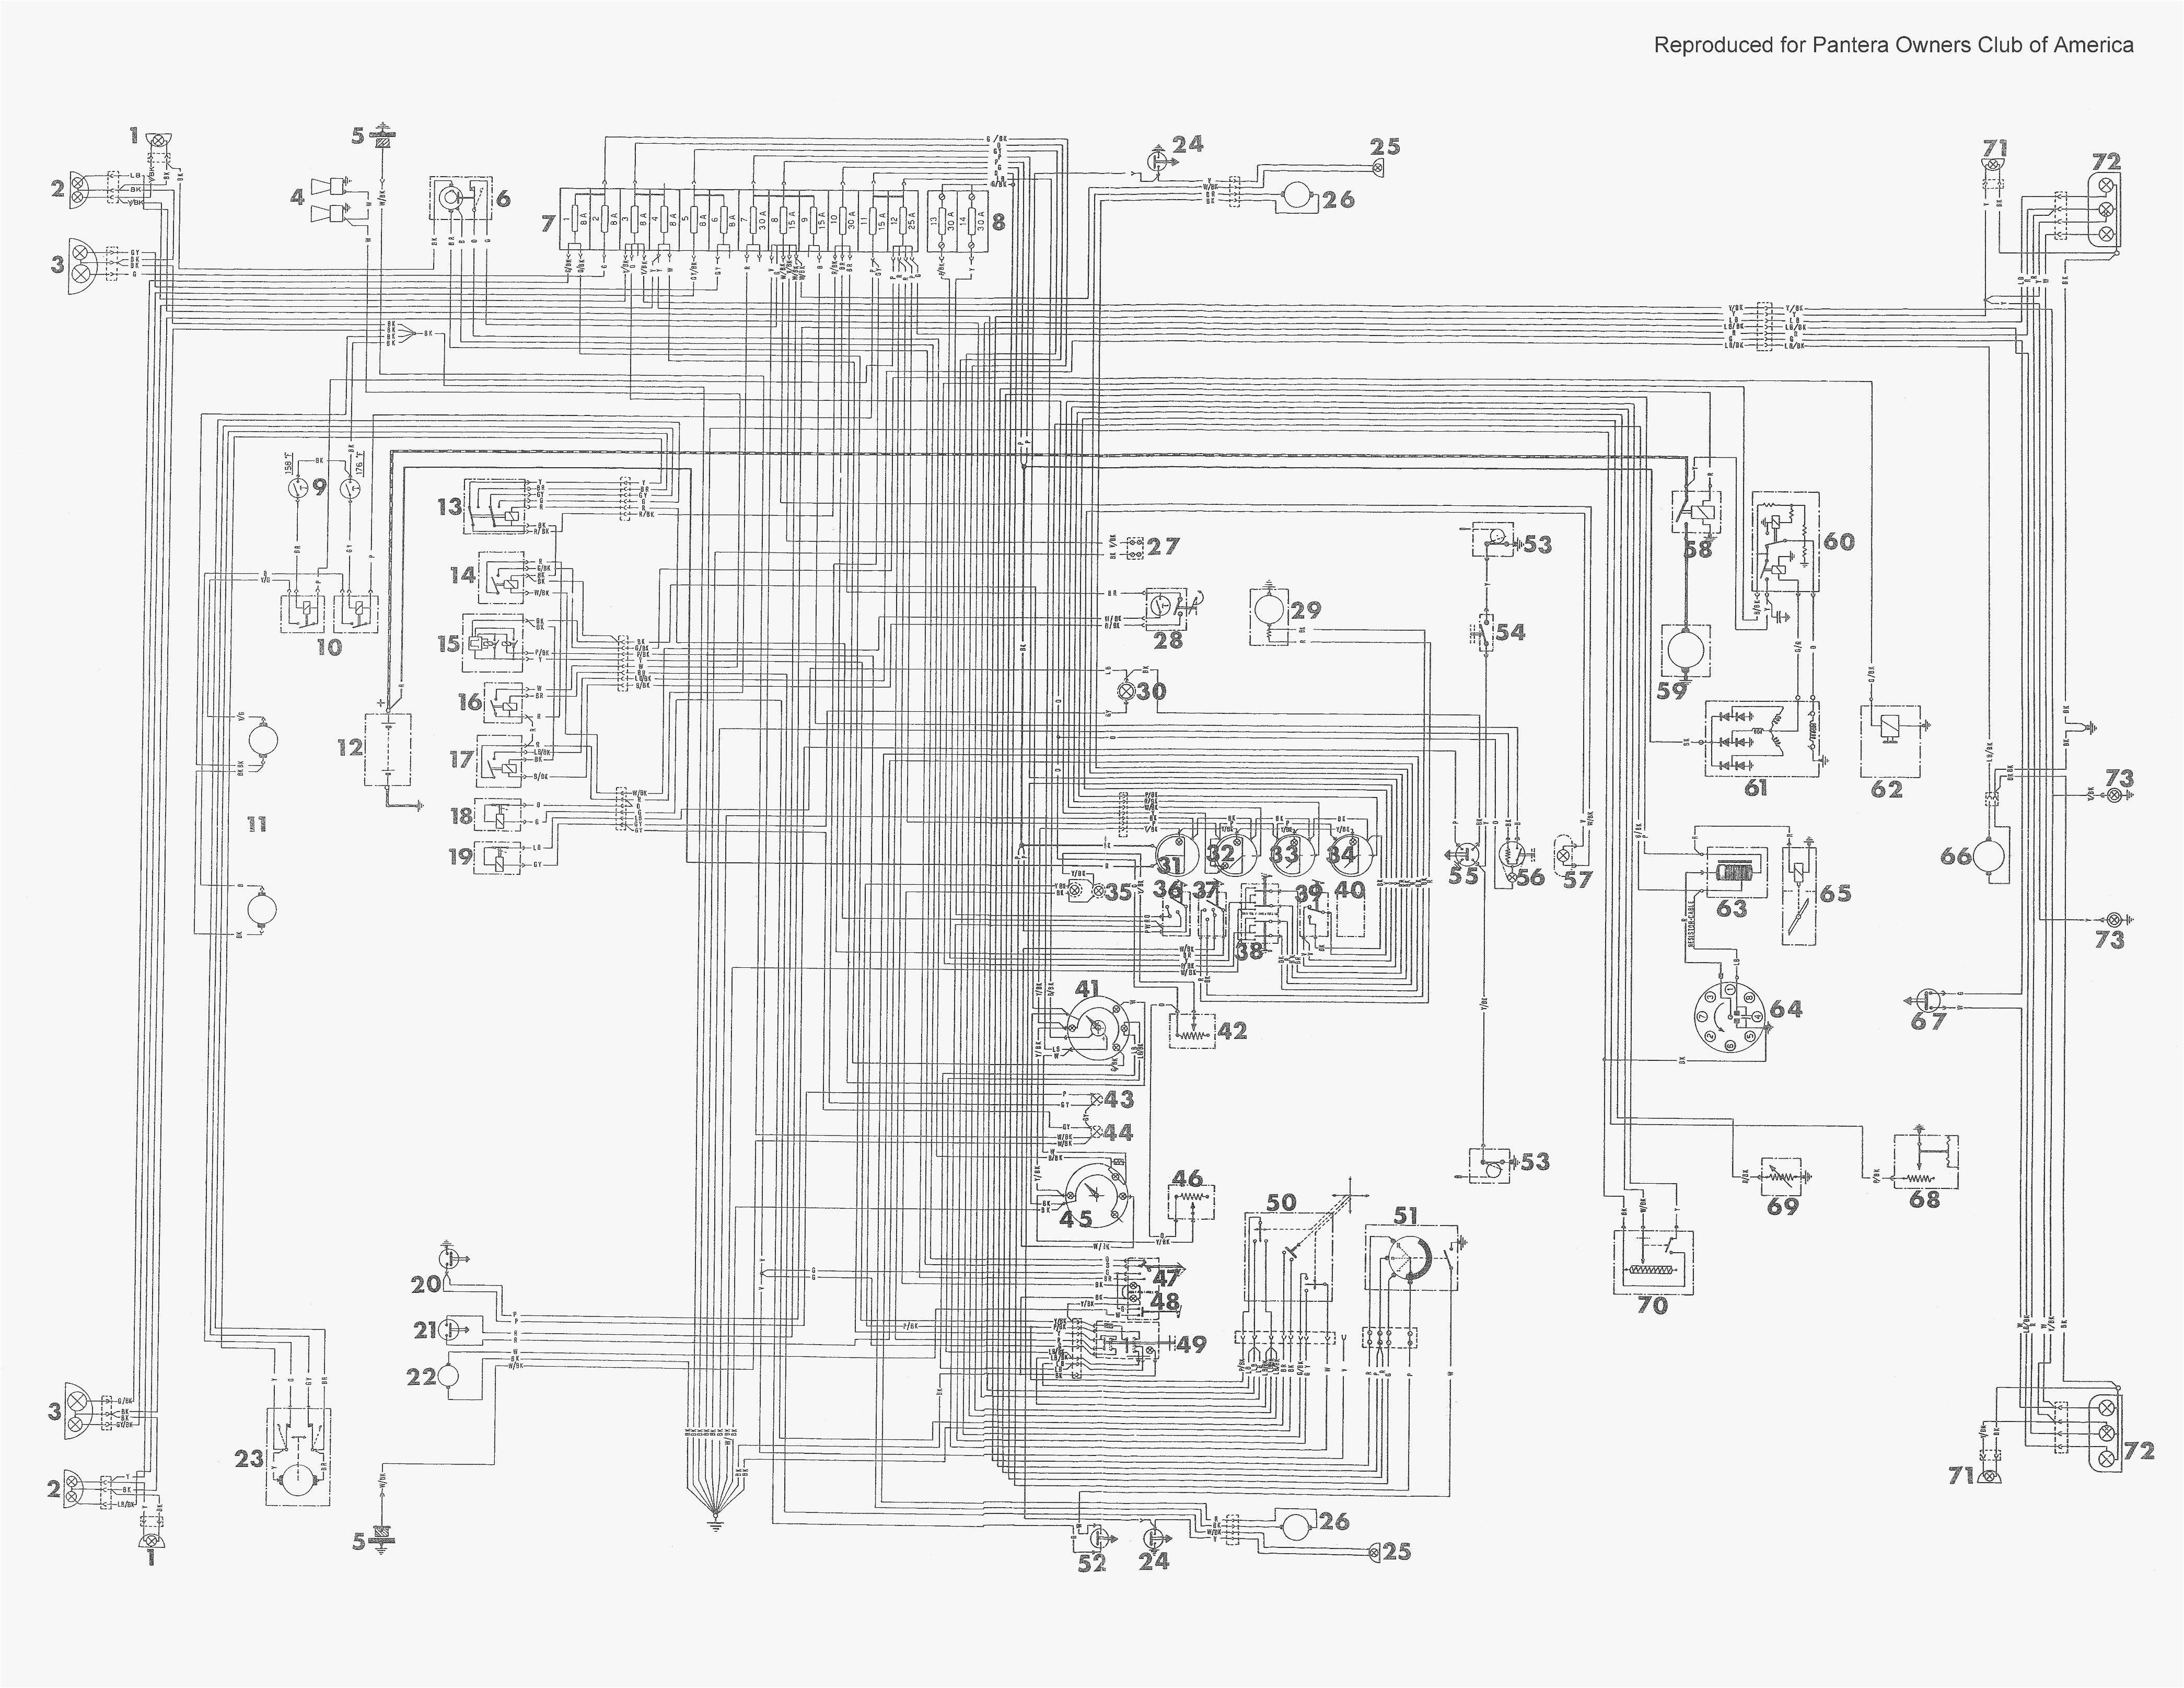 kenworth t370 wiring diagram inspirational kenworth t300 tractor wiring diagrams enthusiast wiring diagrams